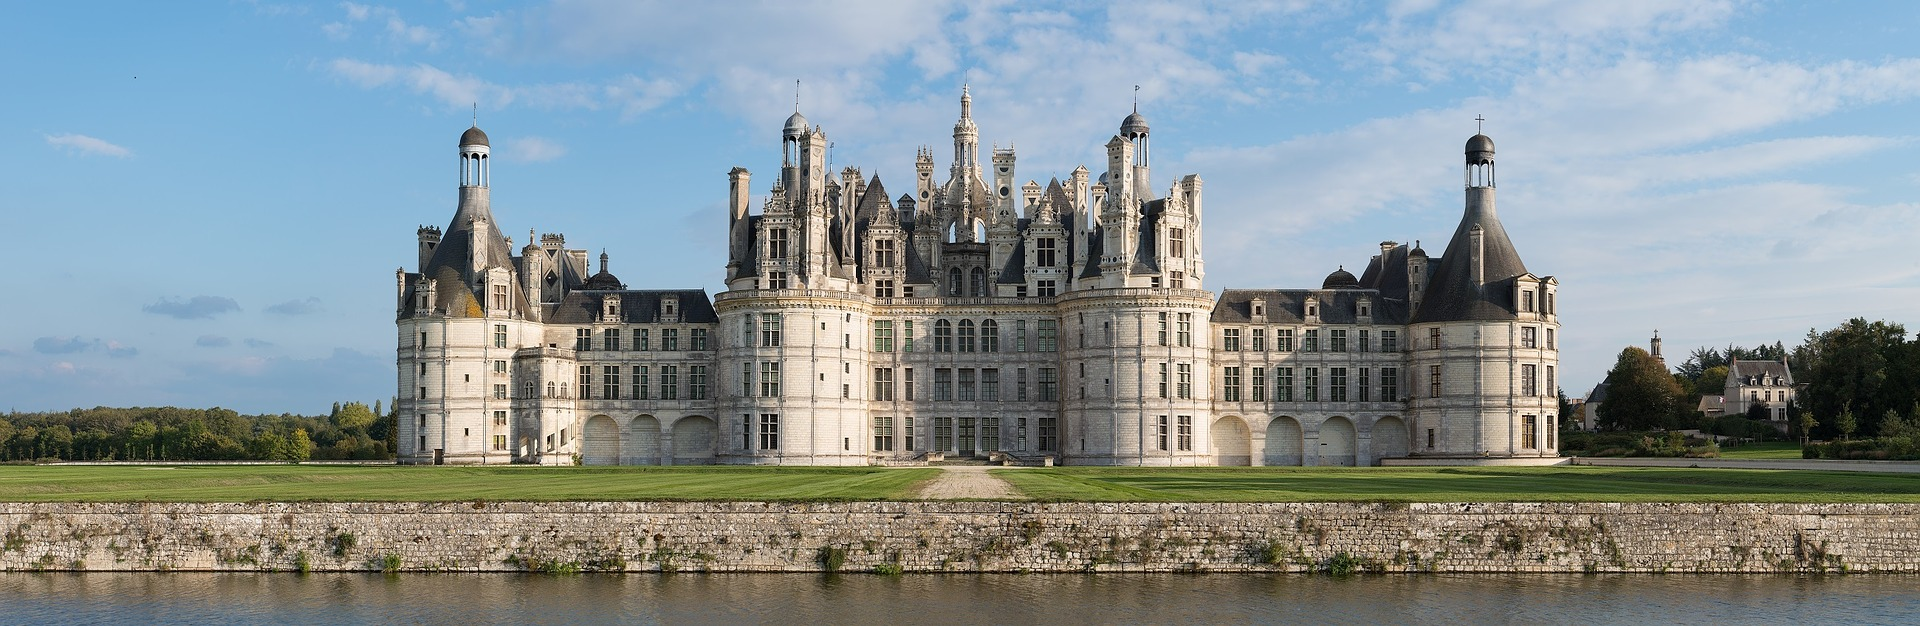 chateau-chambord-1088272_1920.jpg